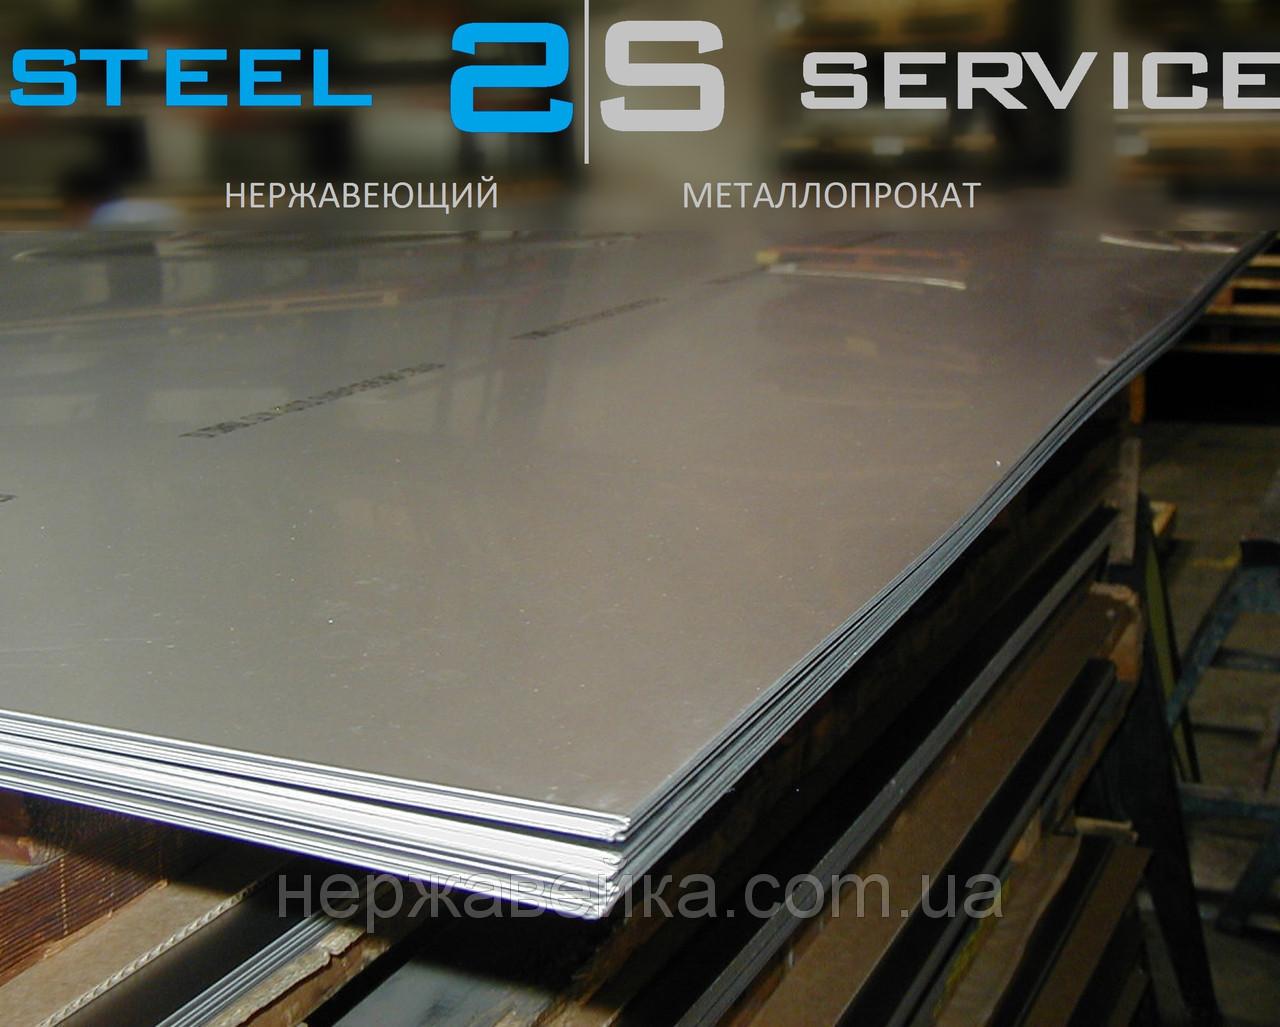 Нержавеющий лист 8х1500х6000ммAISI 430(12Х17) 2B - матовый, технический